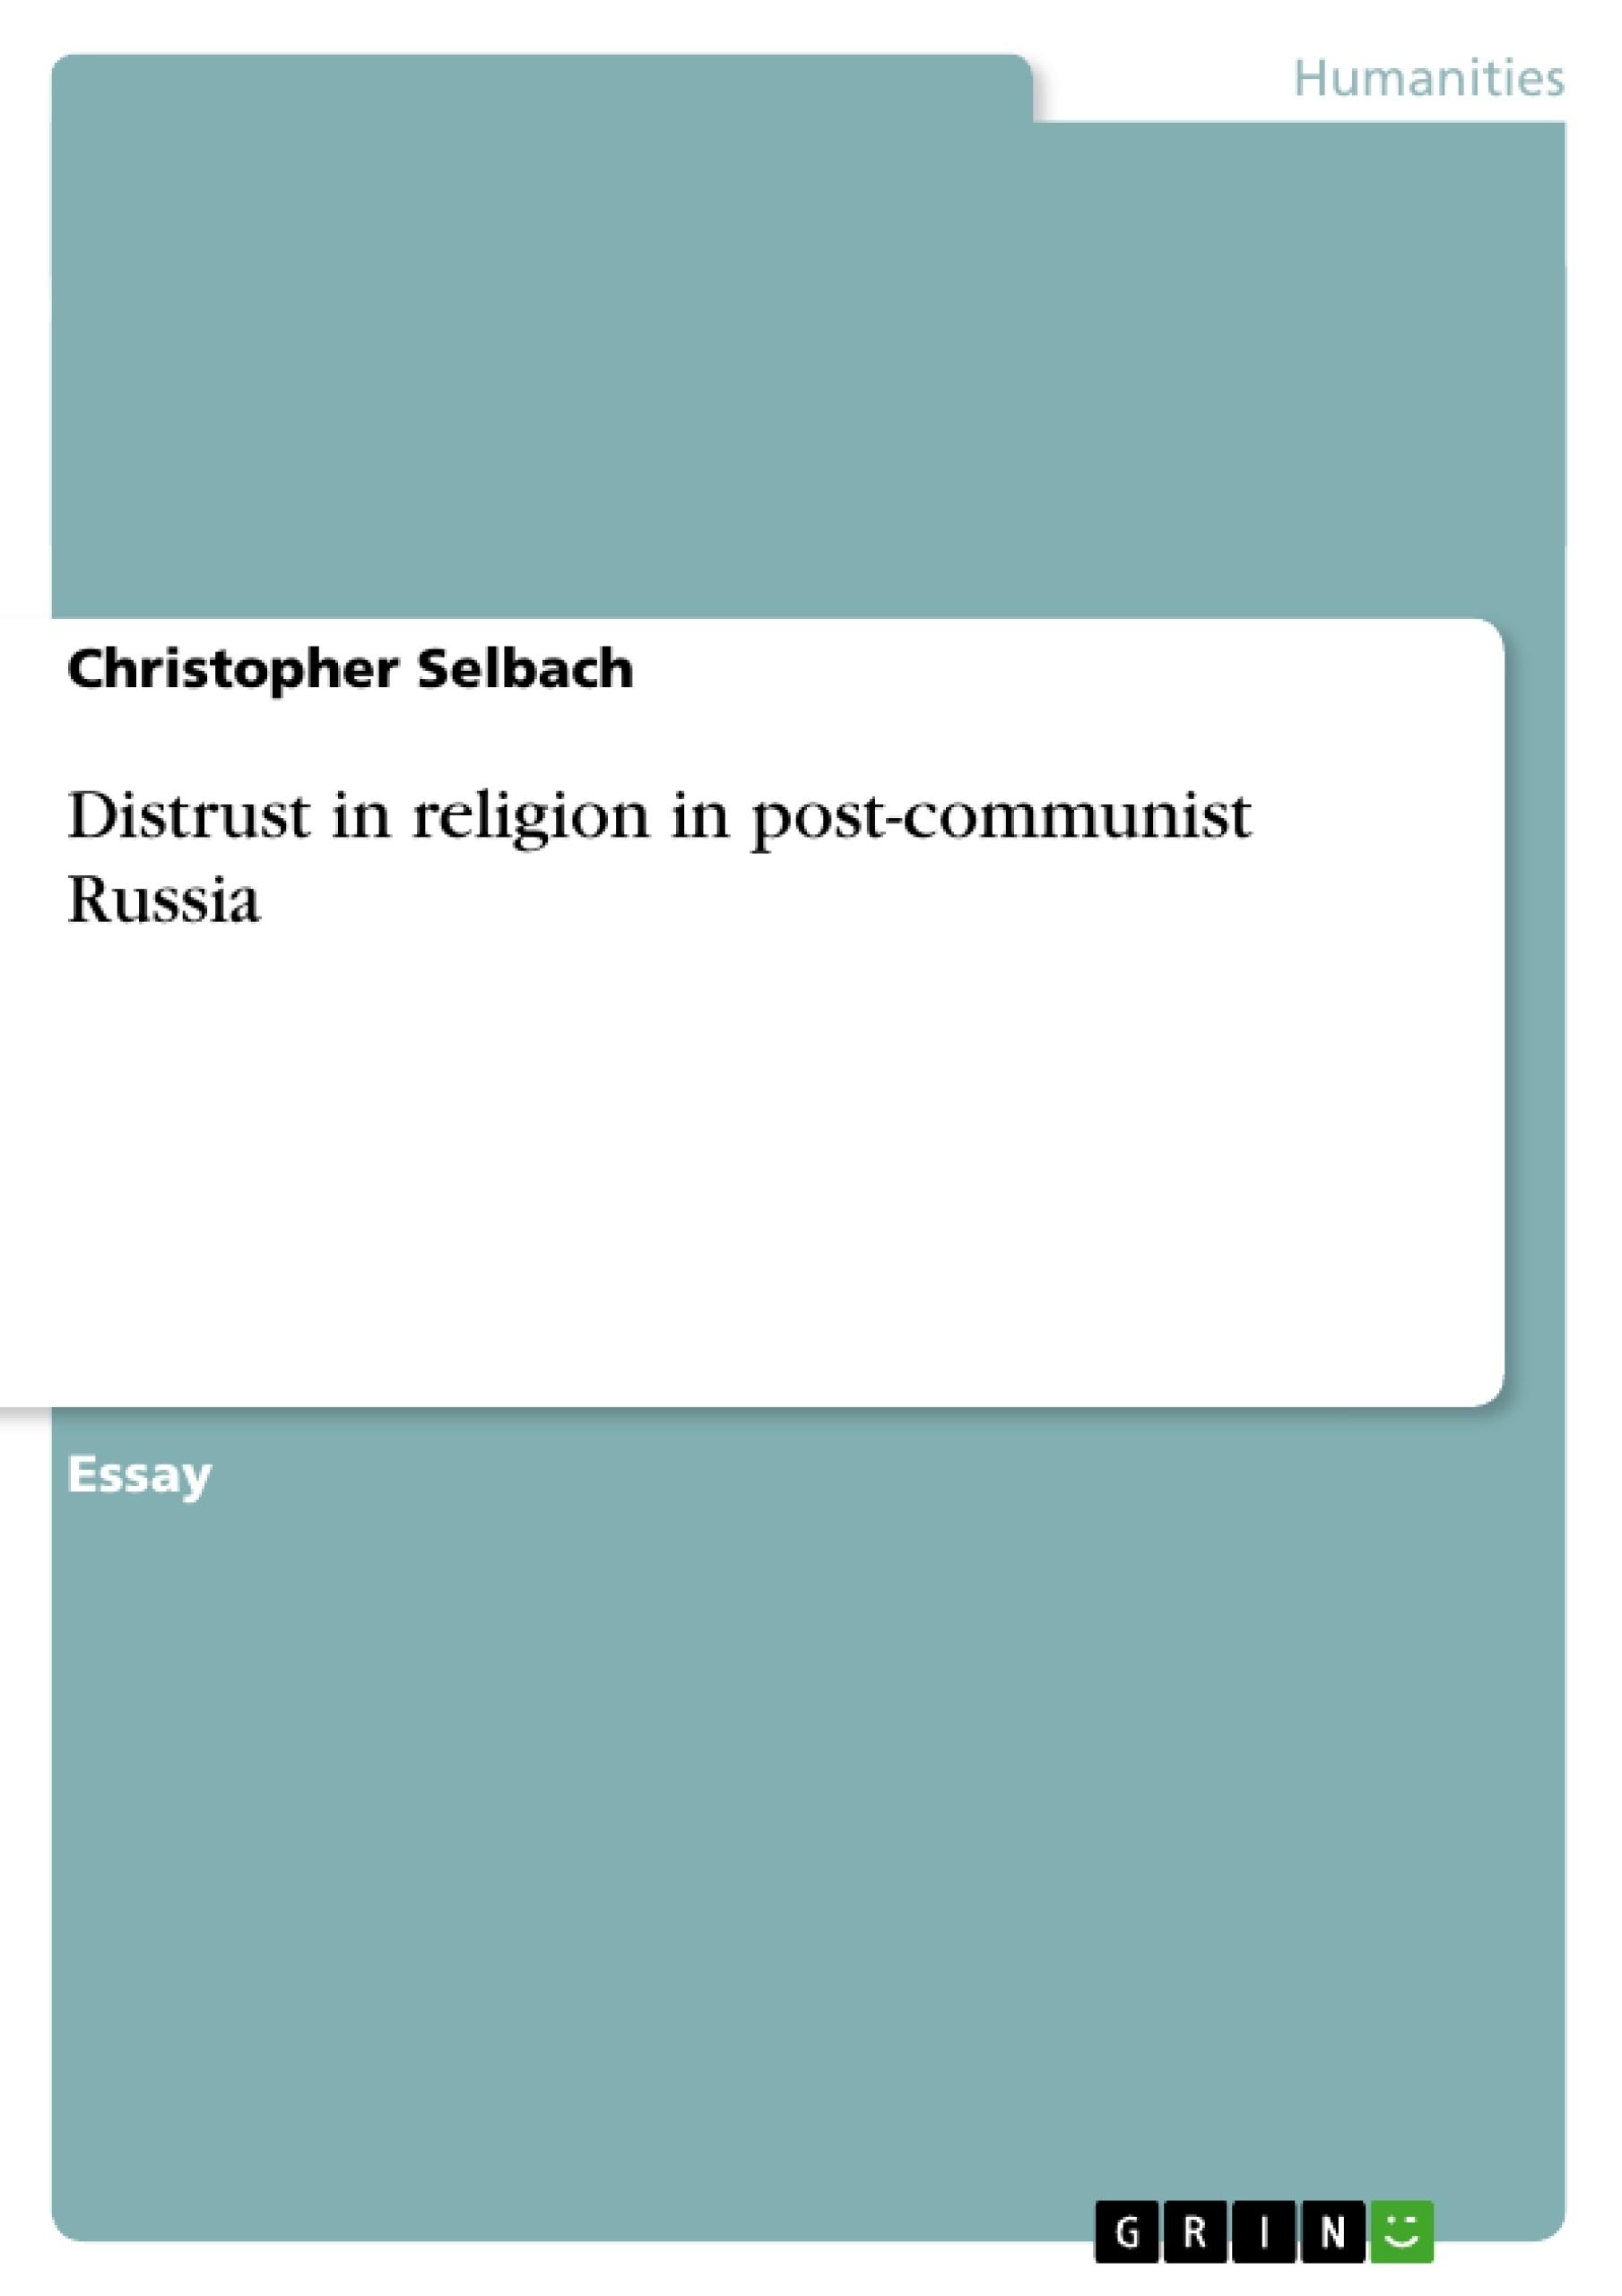 Title: Distrust in religion in post-communist Russia